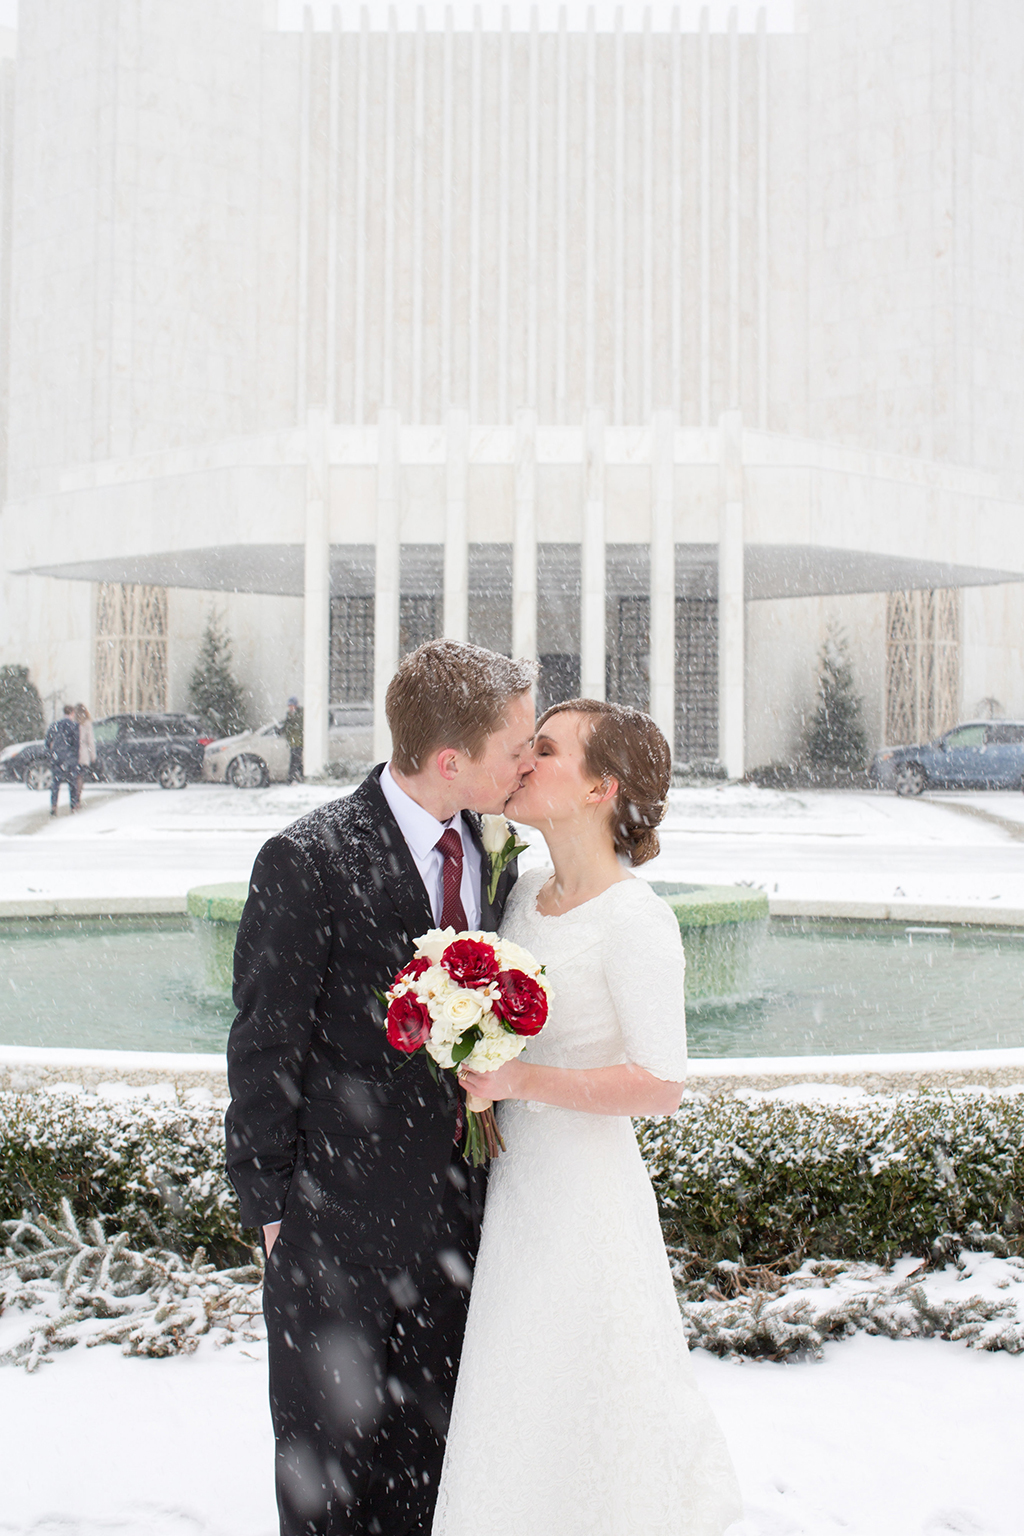 Washington DC snowstorm wedding jonas